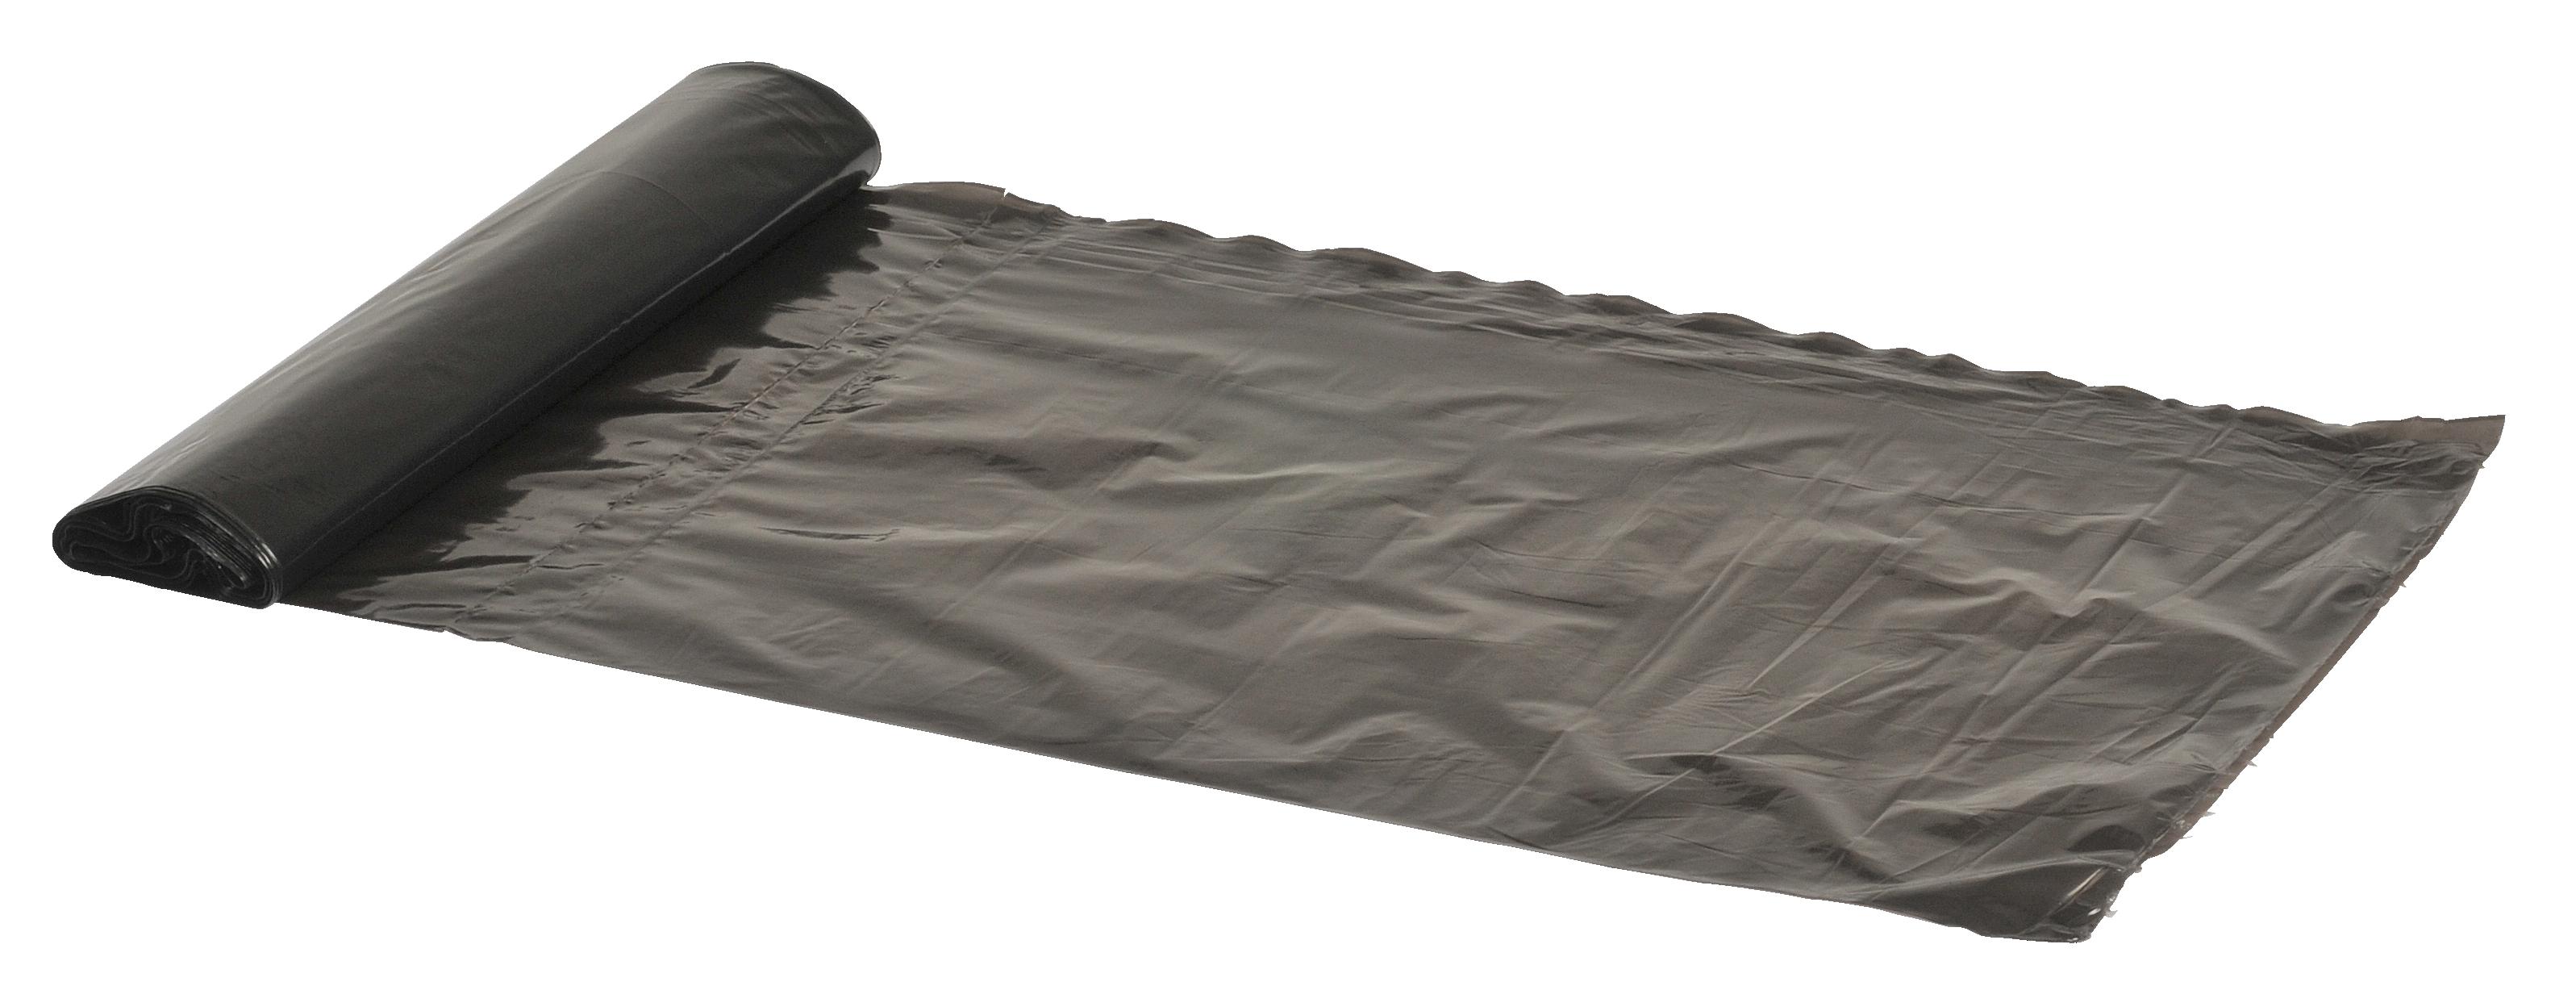 Poly-Line Müllbeutel, 20 my, LDPE, 32 x 24 Stück, grau, 50 x 65 cm/ 30 Liter